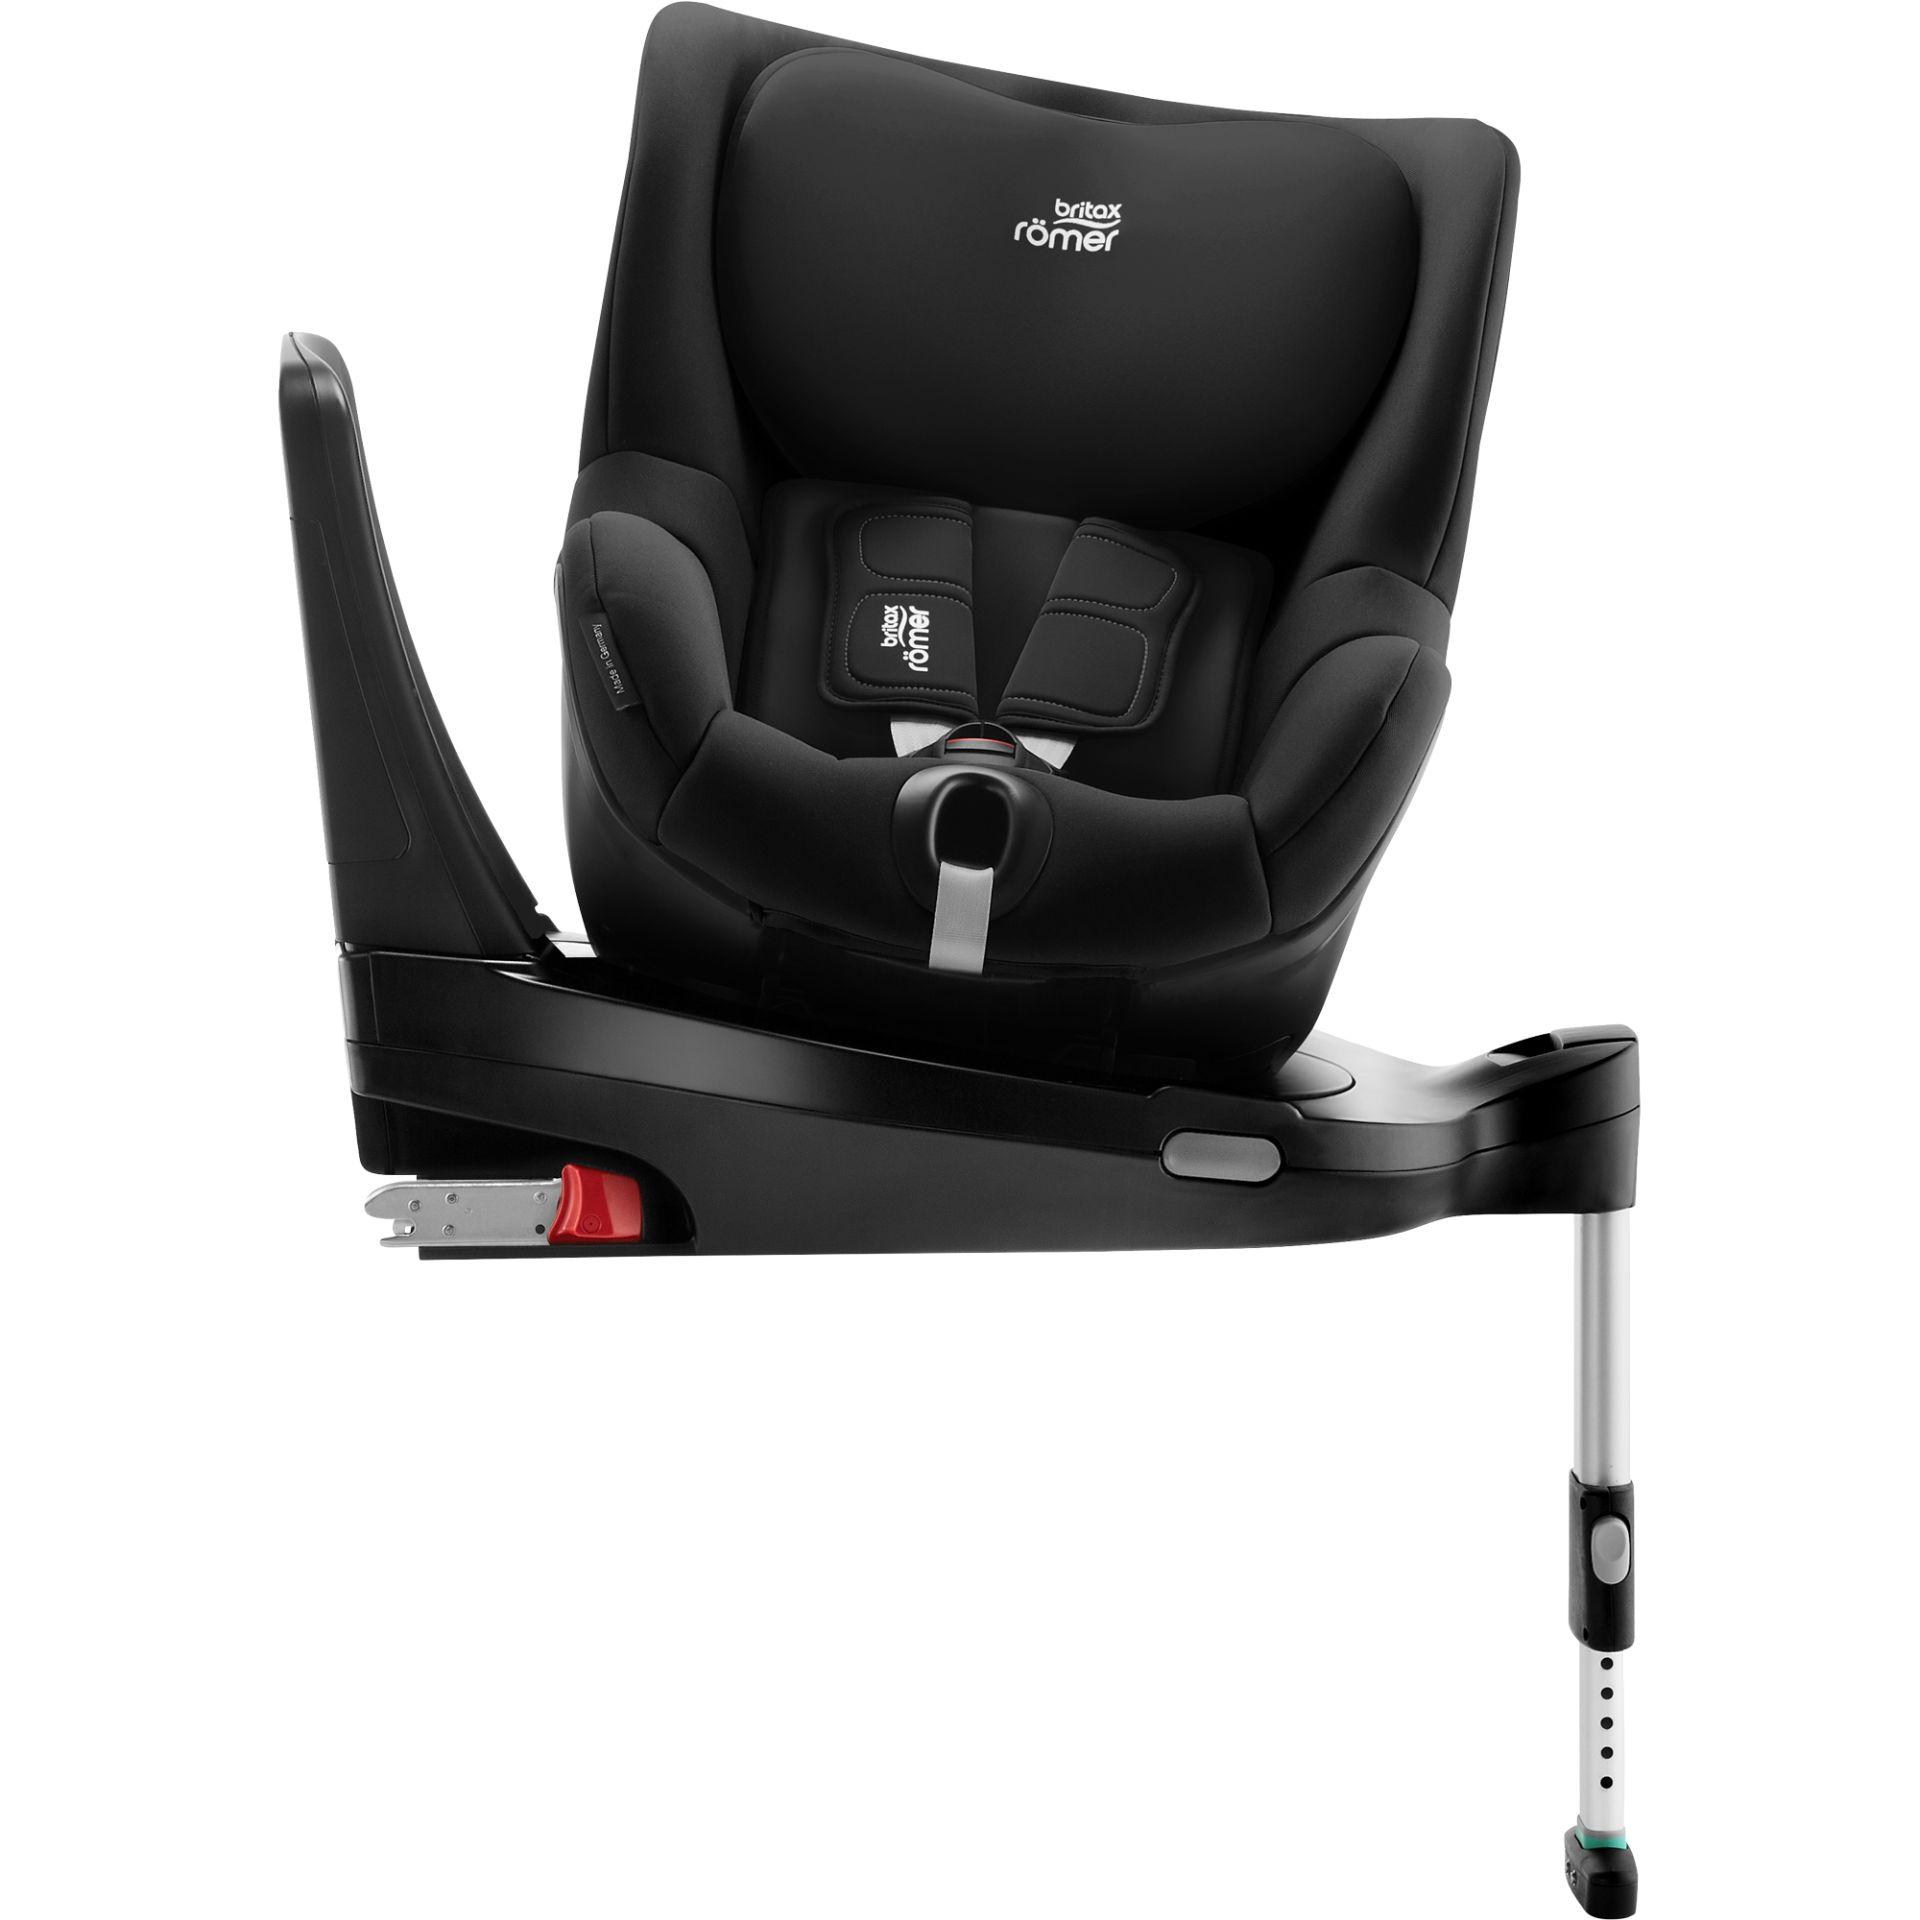 britax r mer child car seat dualfix i size 2019 cosmos black buy at kidsroom car seats. Black Bedroom Furniture Sets. Home Design Ideas